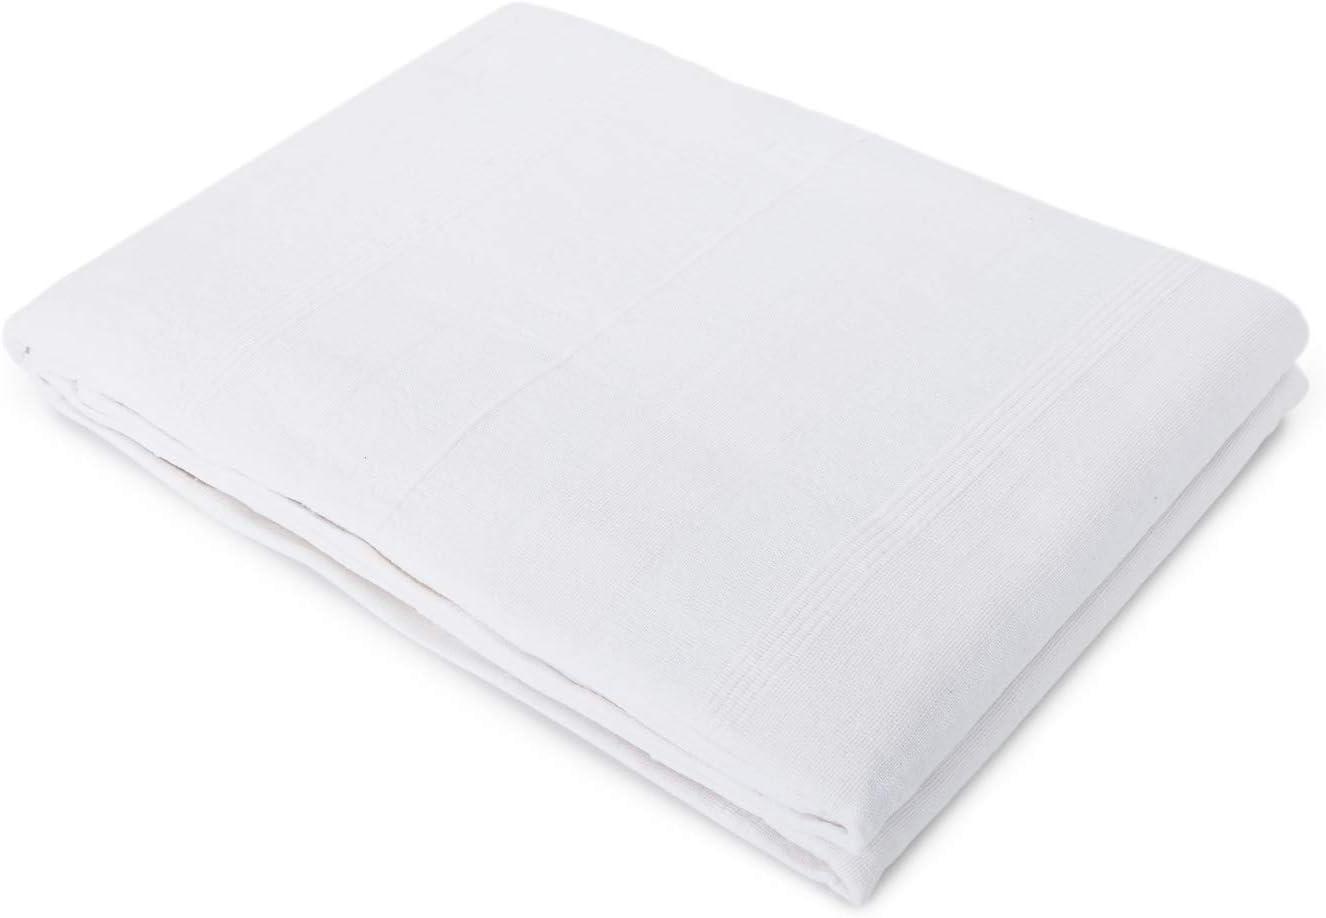 Blanco, 240x260 Montse Interiors Colcha Plaid Multifunci/ón para Sof/á o Cama Algod/ón 100/% Verdi